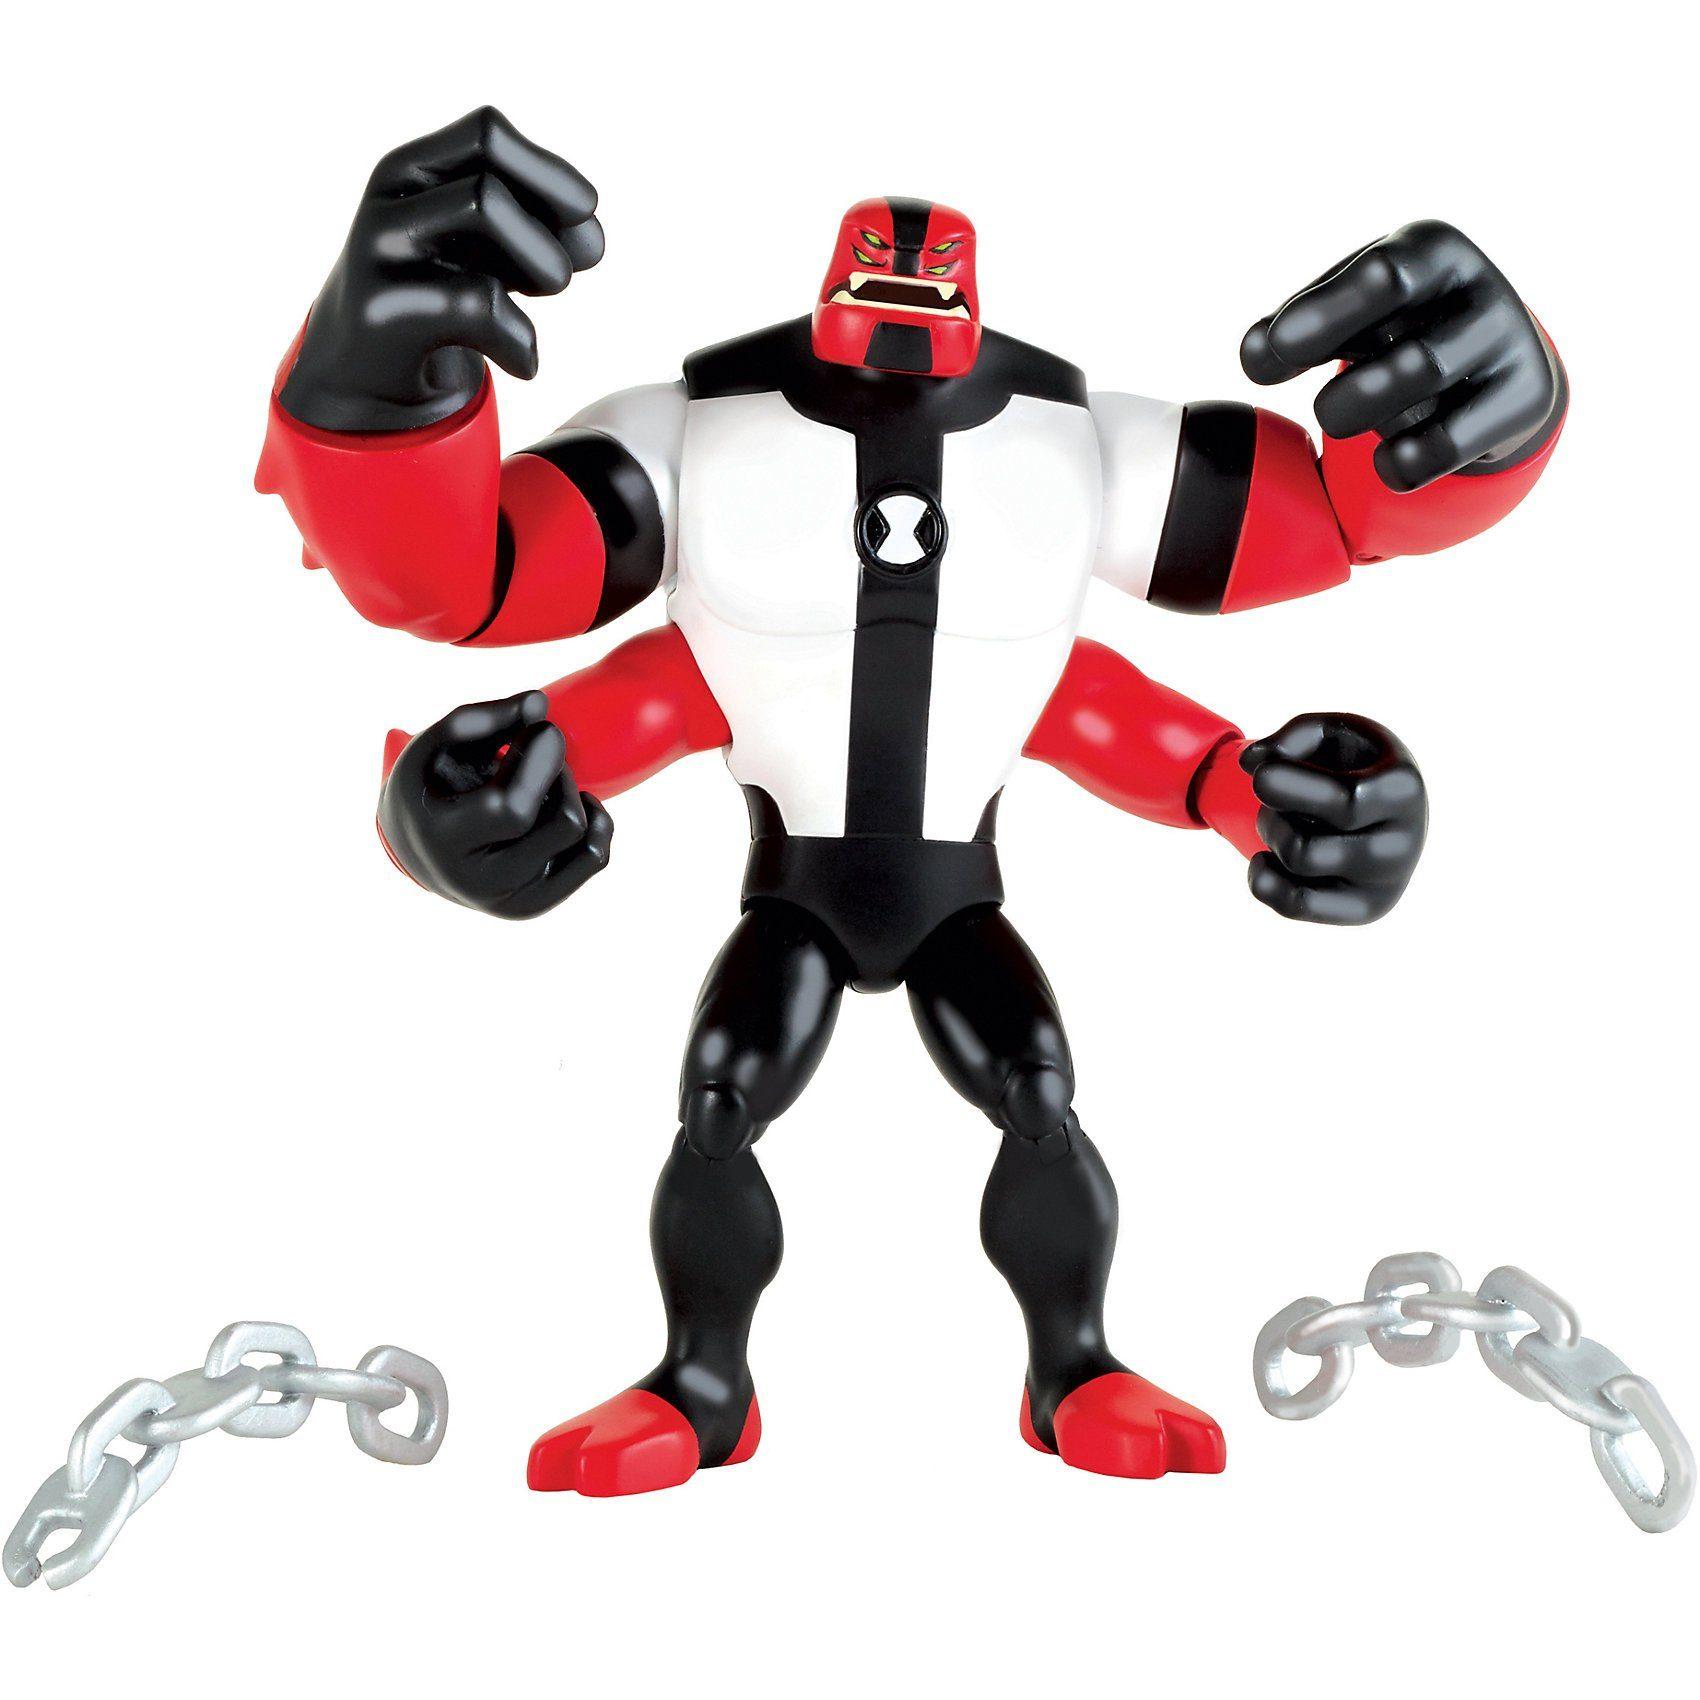 Giochi Preziosi Ben10 Actionfiguren 13cm Krake (Four Arms)